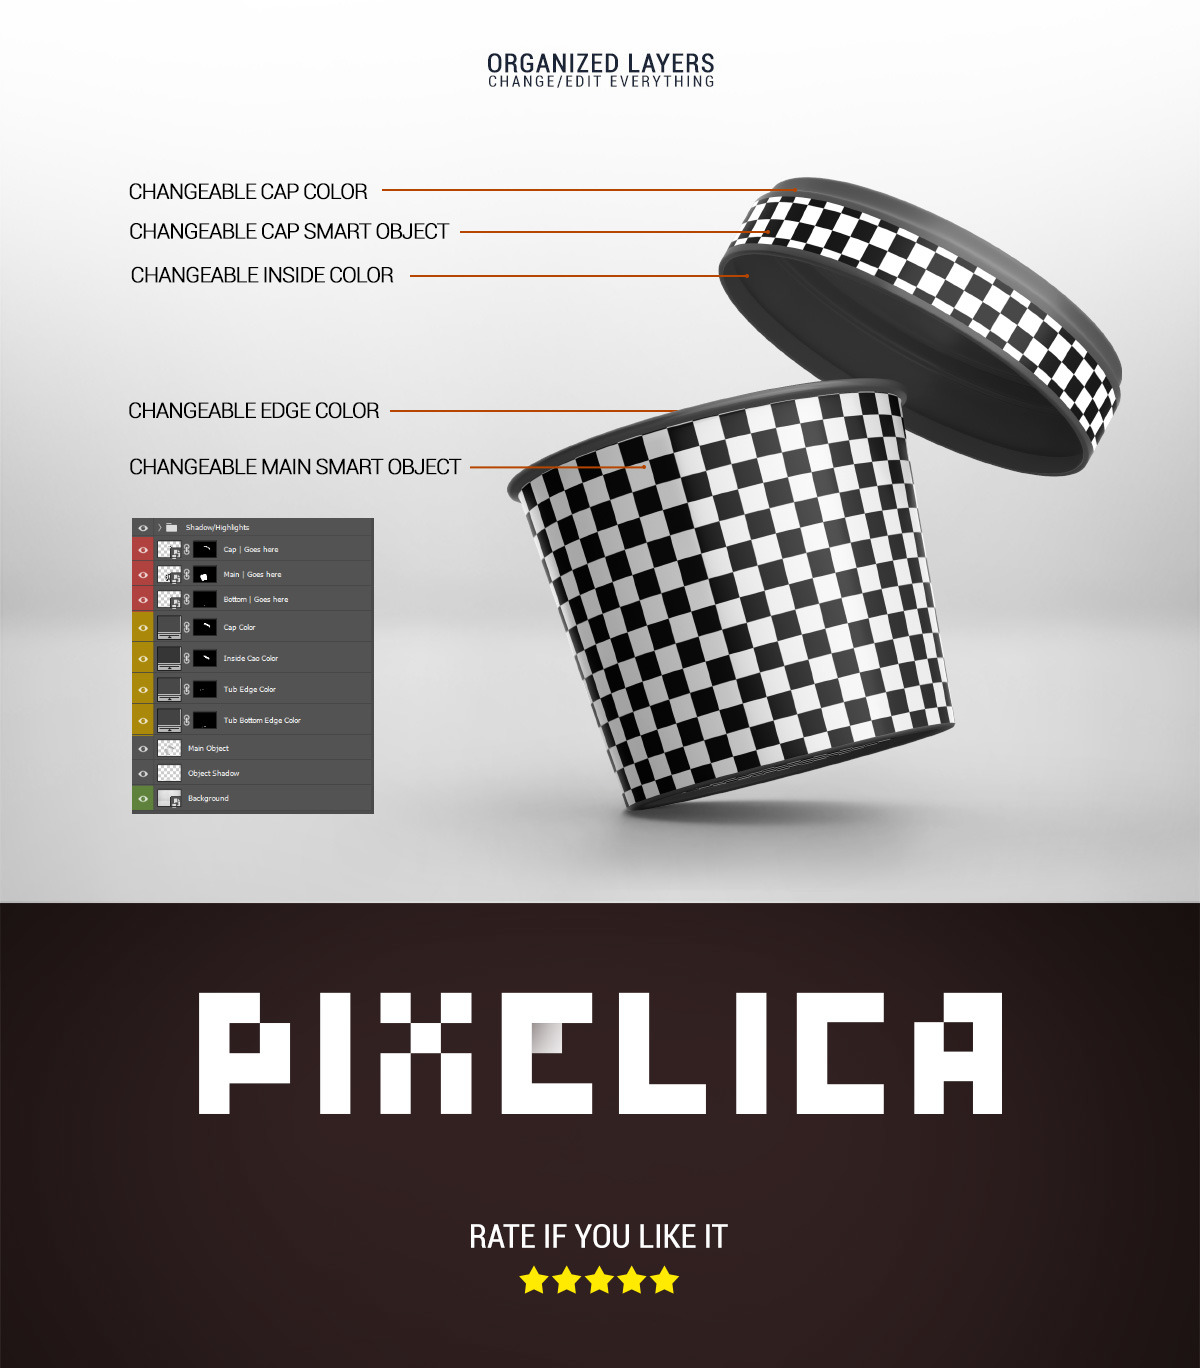 8款冰淇淋杯设计展示样机模板 Ice Cream Cup Mockup插图(4)